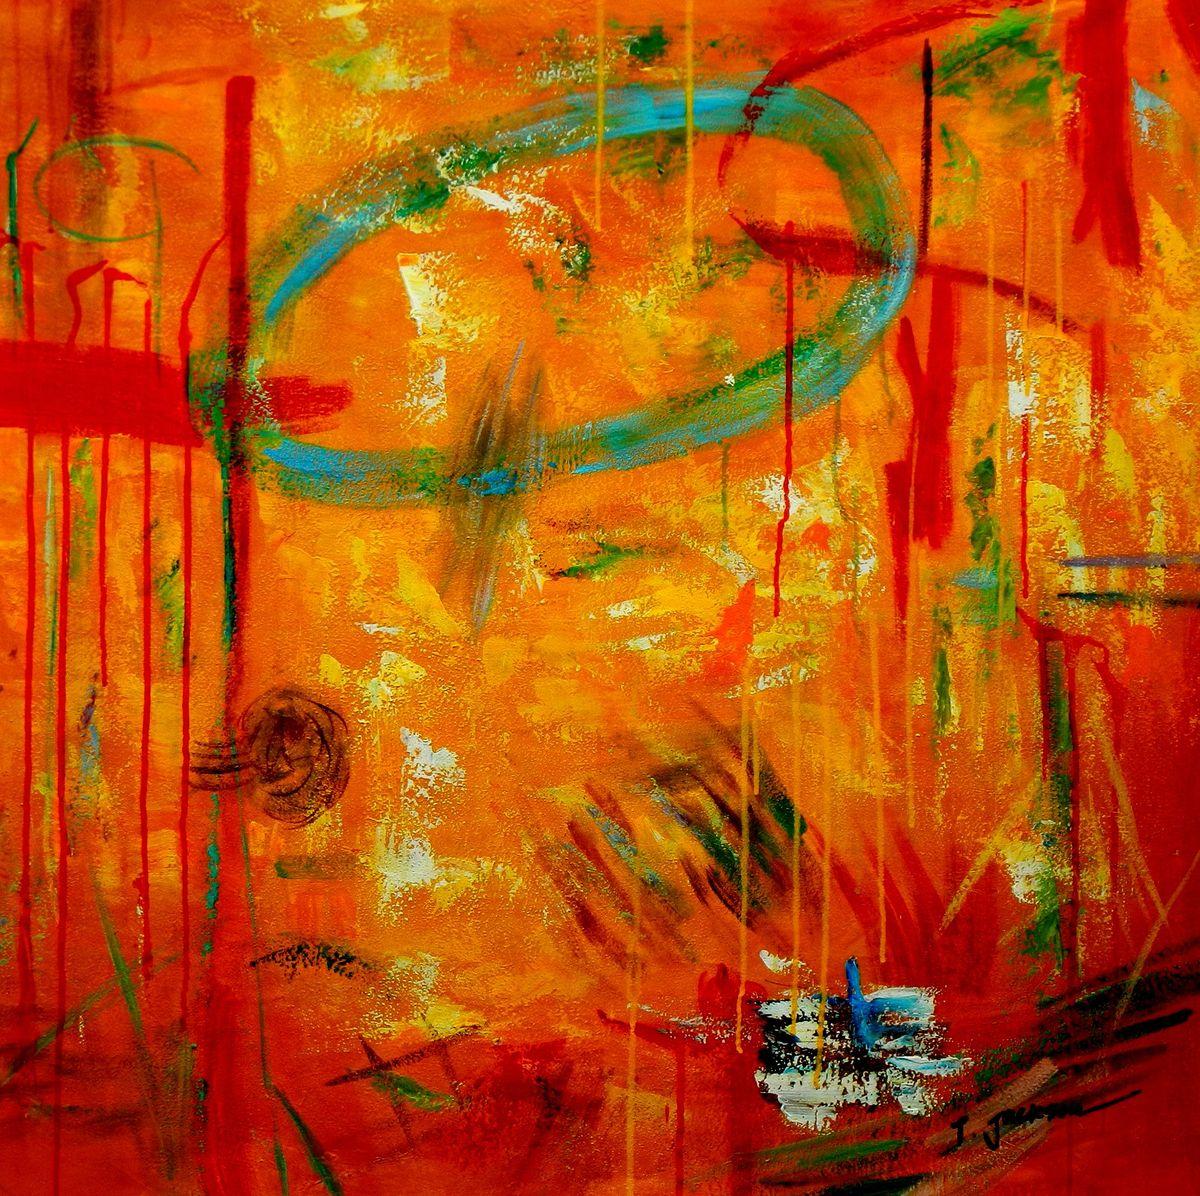 Abstract - The Angola wildlife II g96835 80x80cm abstraktes Ölbild